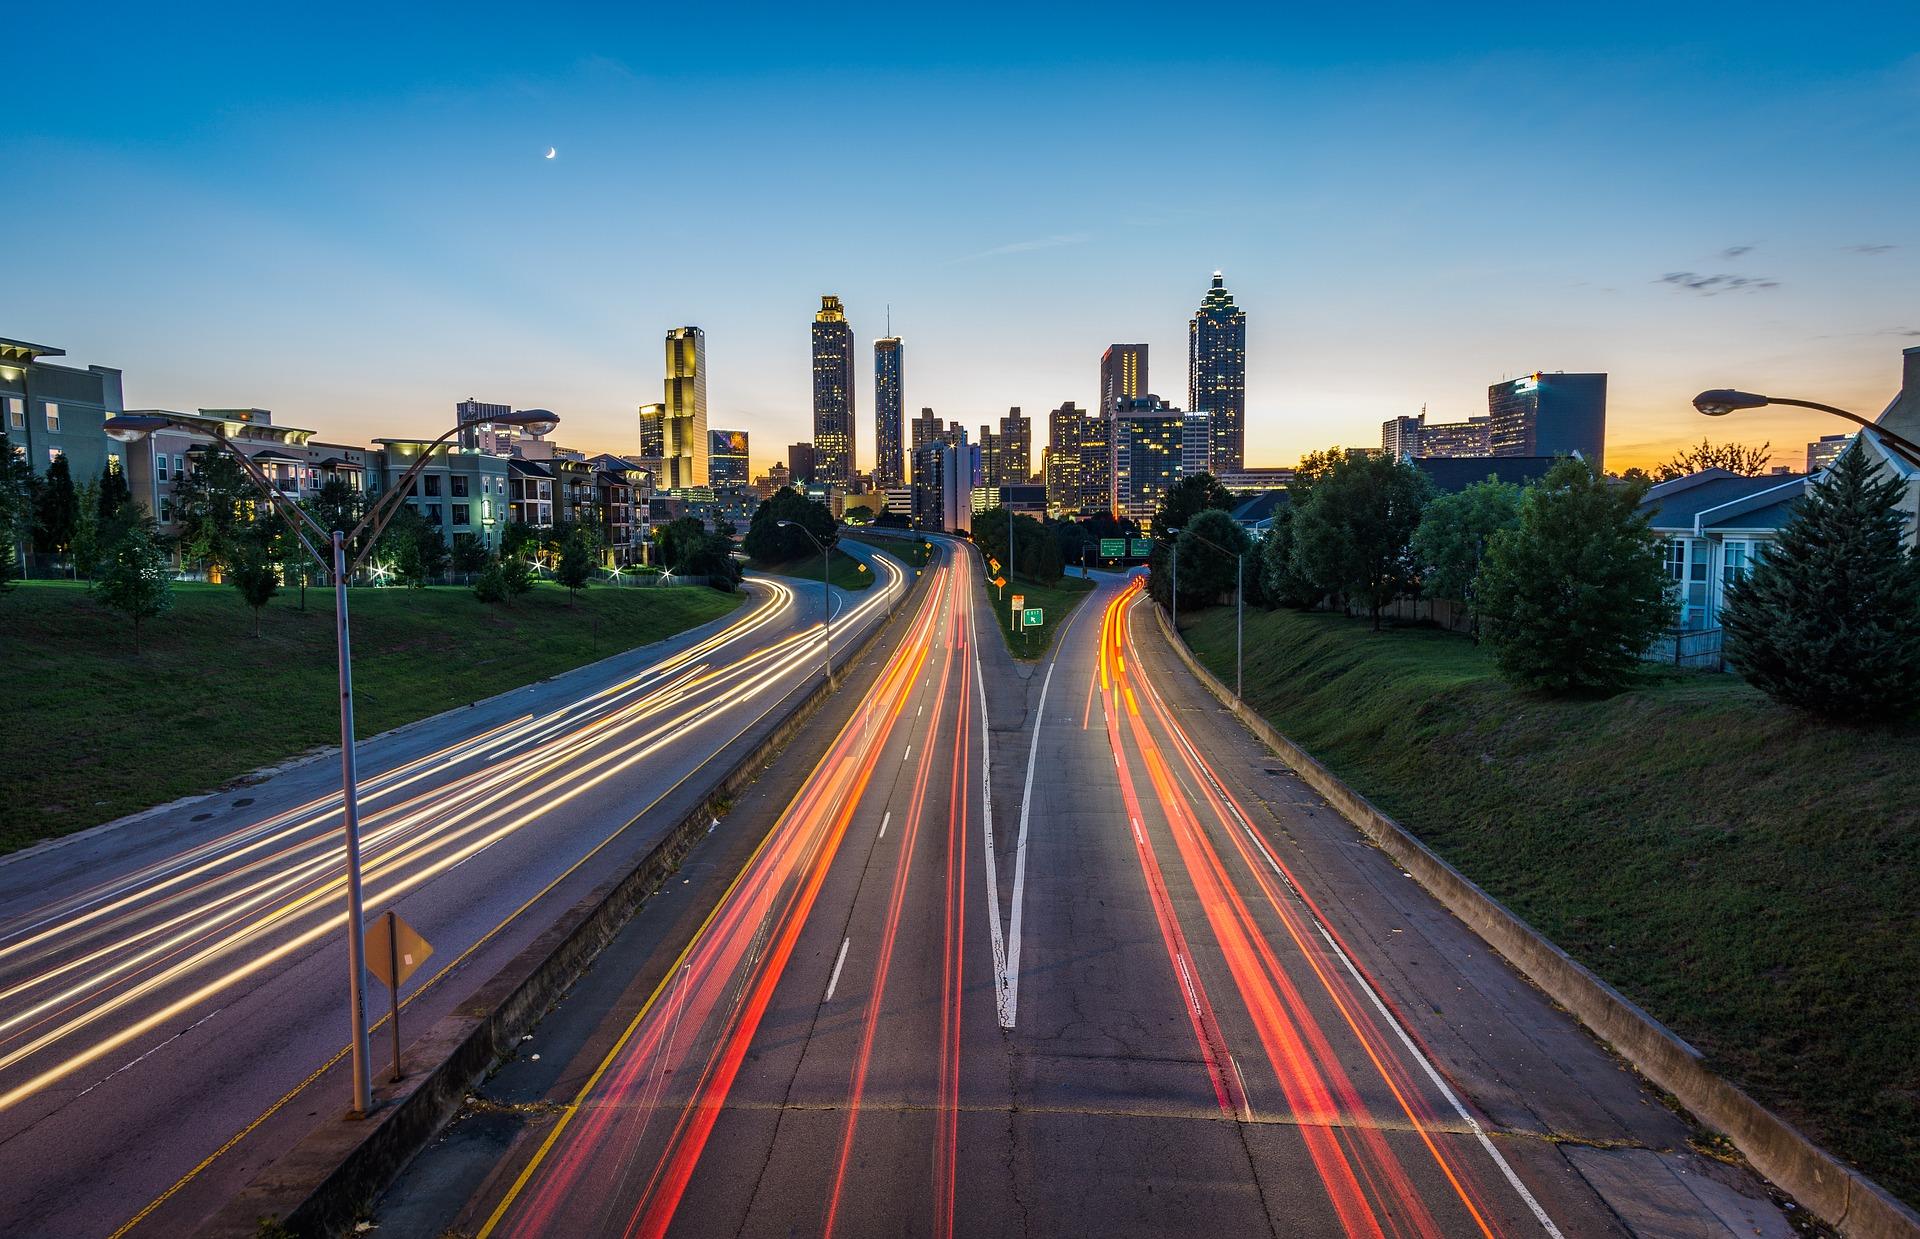 Light-streamed highways heading towards the city